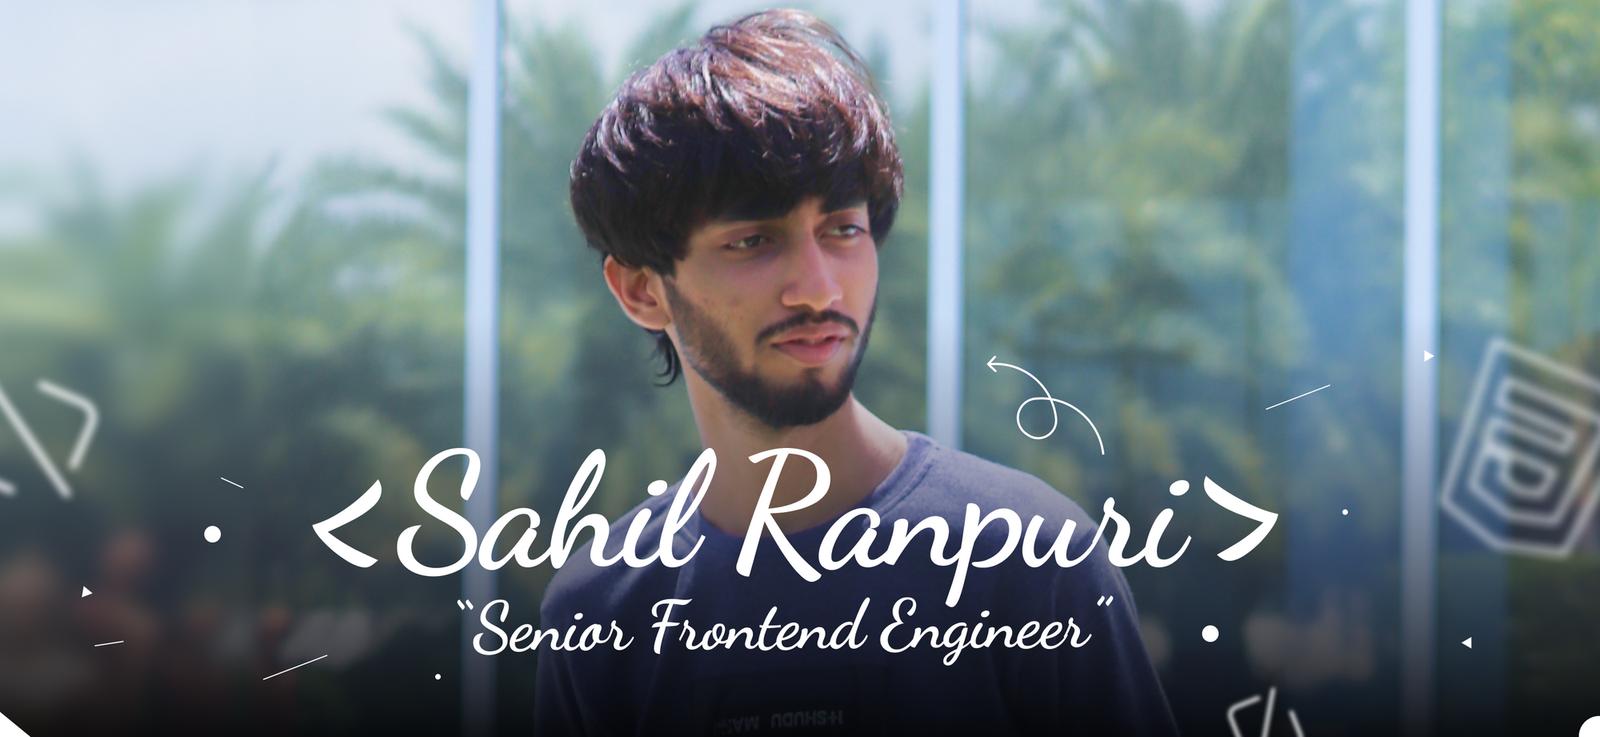 Team Iconscout: Sahil Ranpuri, Senior Frontend Engineer